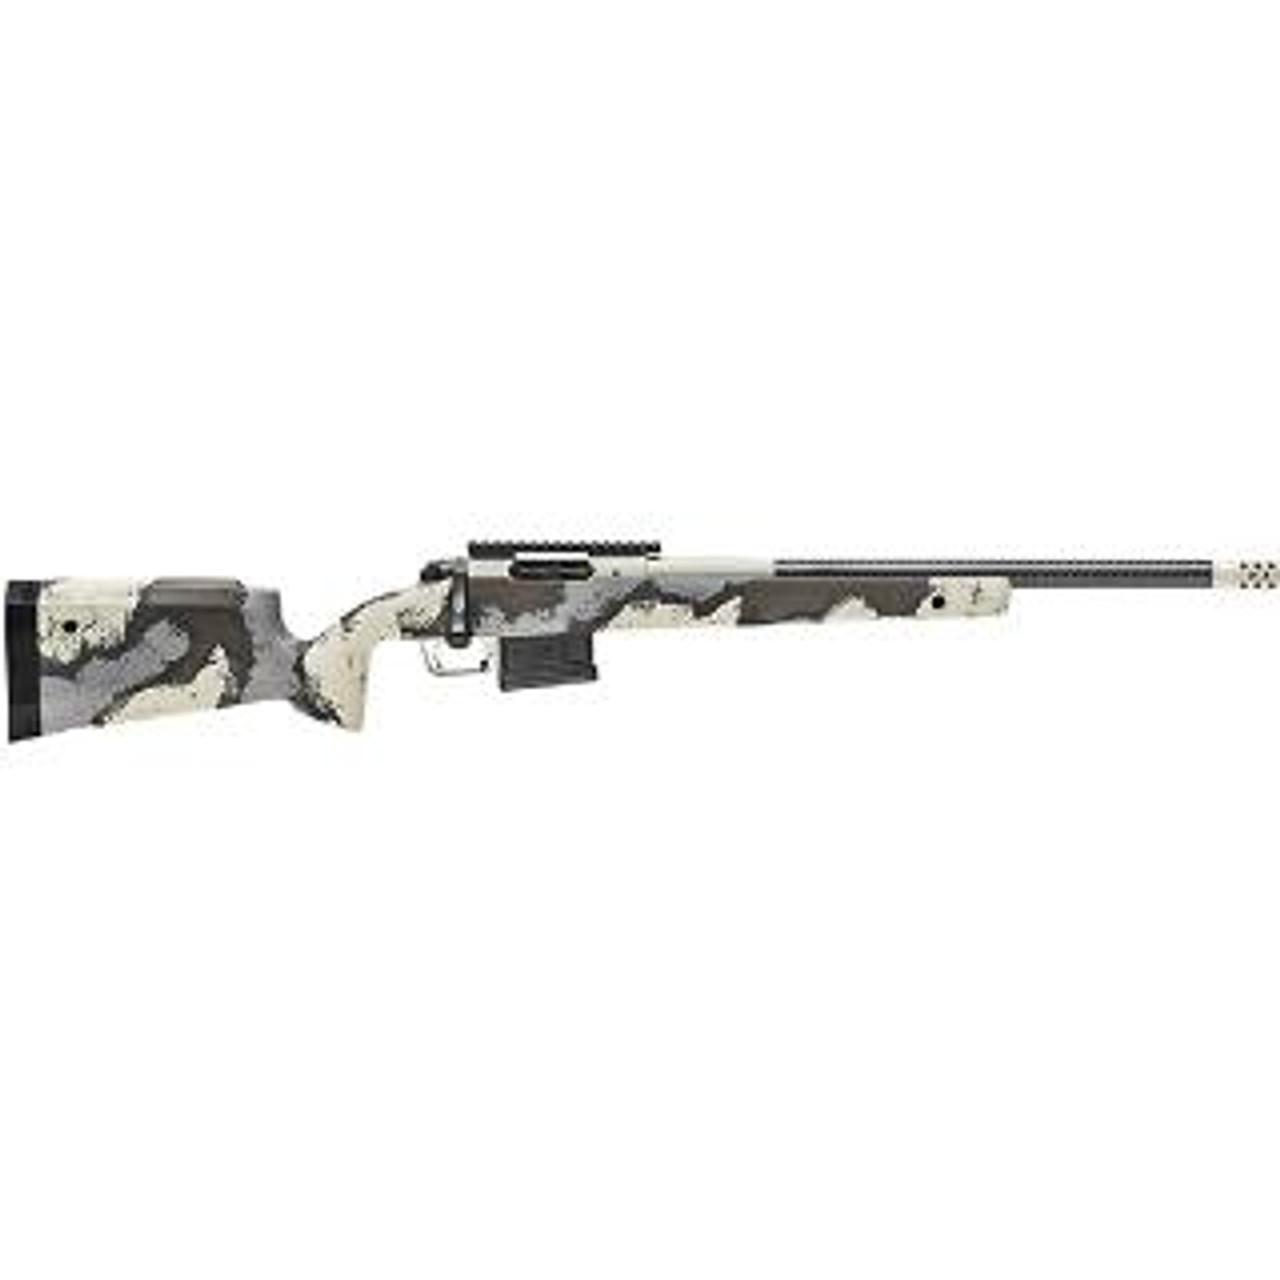 Springfield Model 2020 Waypoint CF CALIFORNIA LEGAL - 6mm Creedmoor - Ridgeline Camo